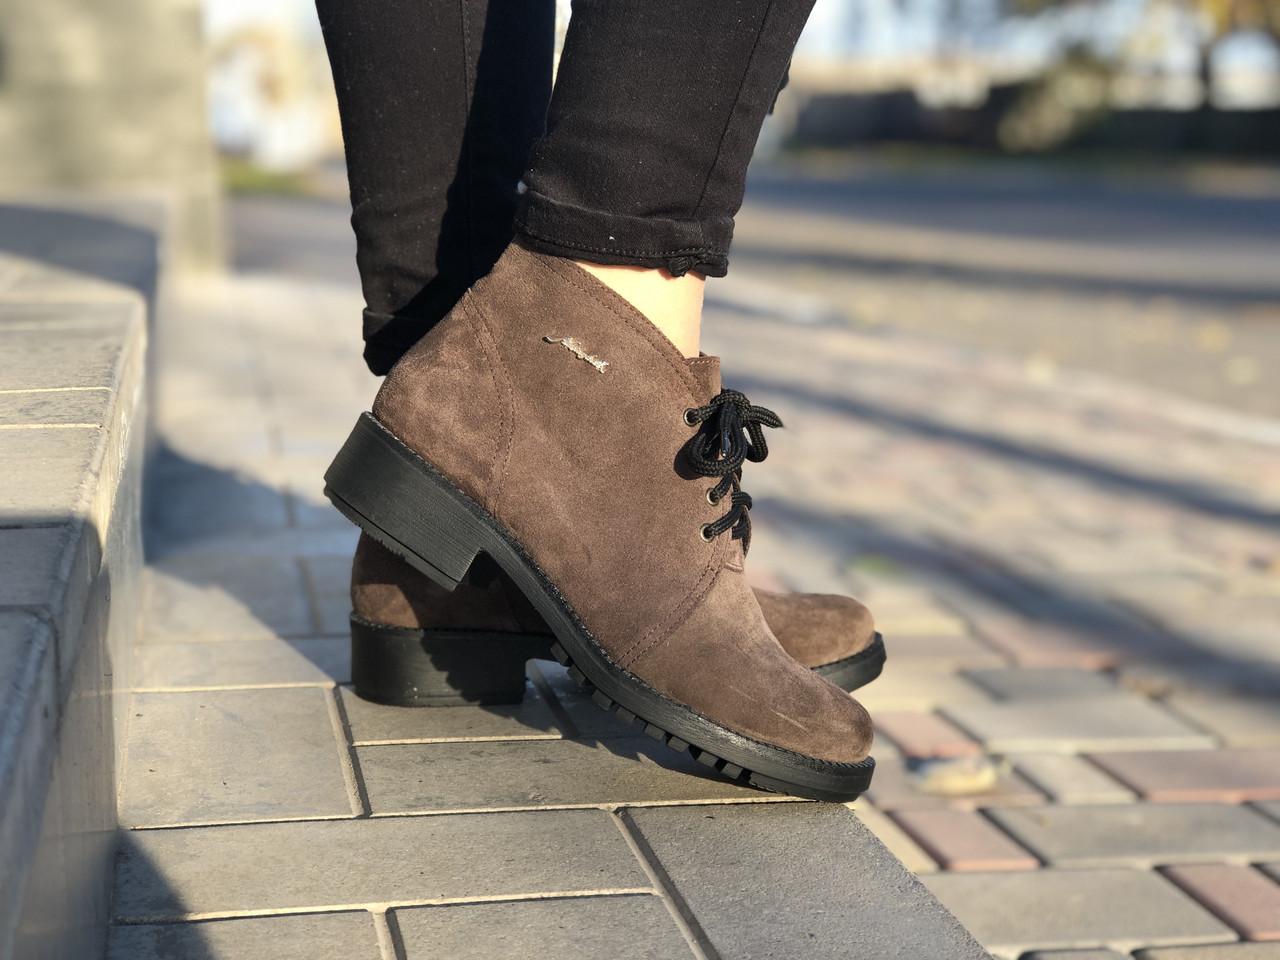 Кожаные Женские ботинки 854 кор Aleksandr размеры 38,39